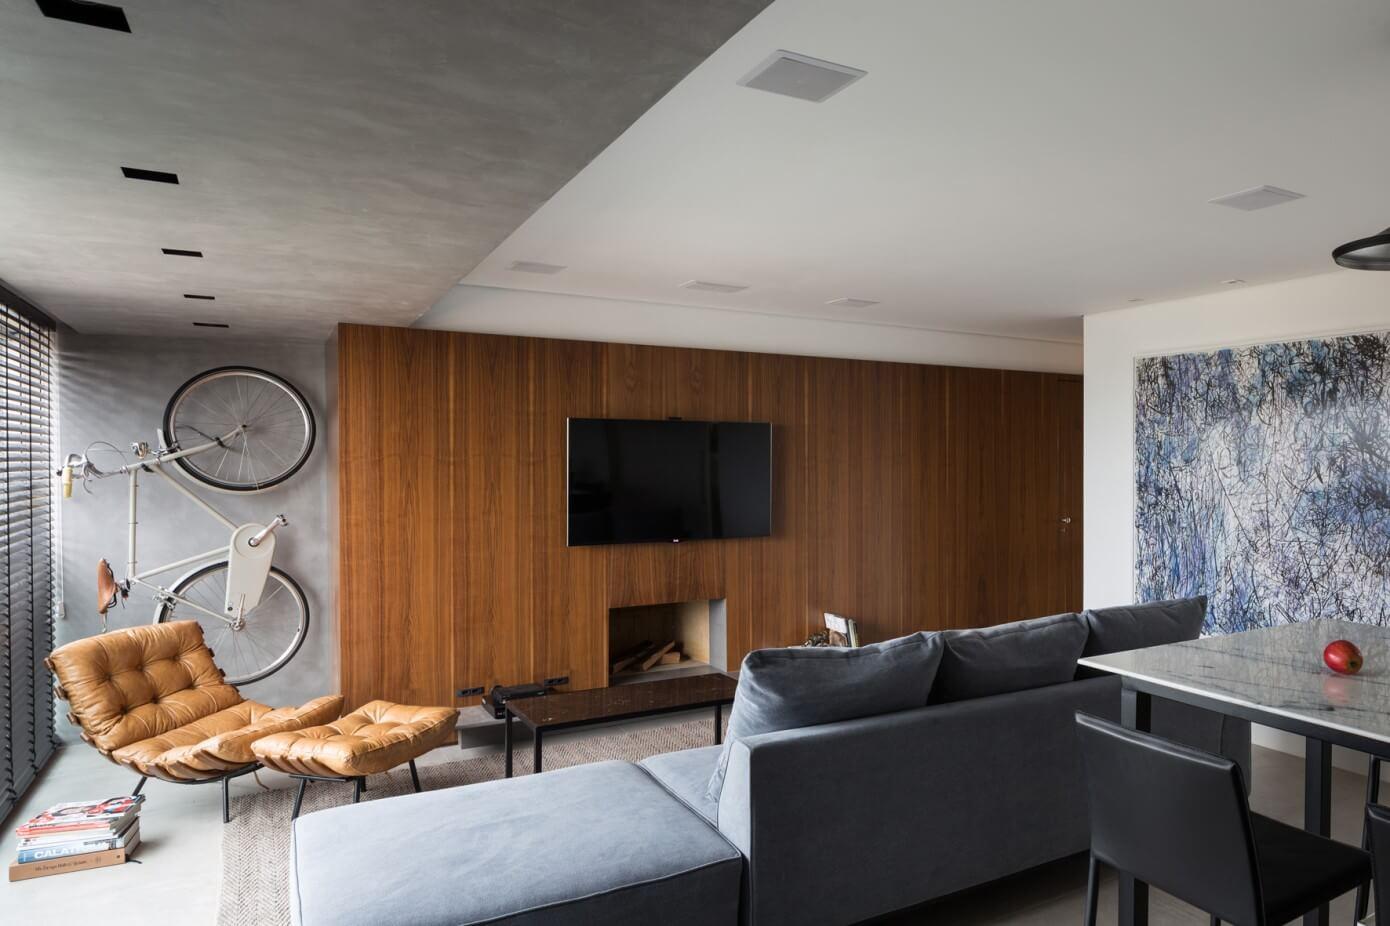 Living Room Jb jb apartmentambidestro | homeadore